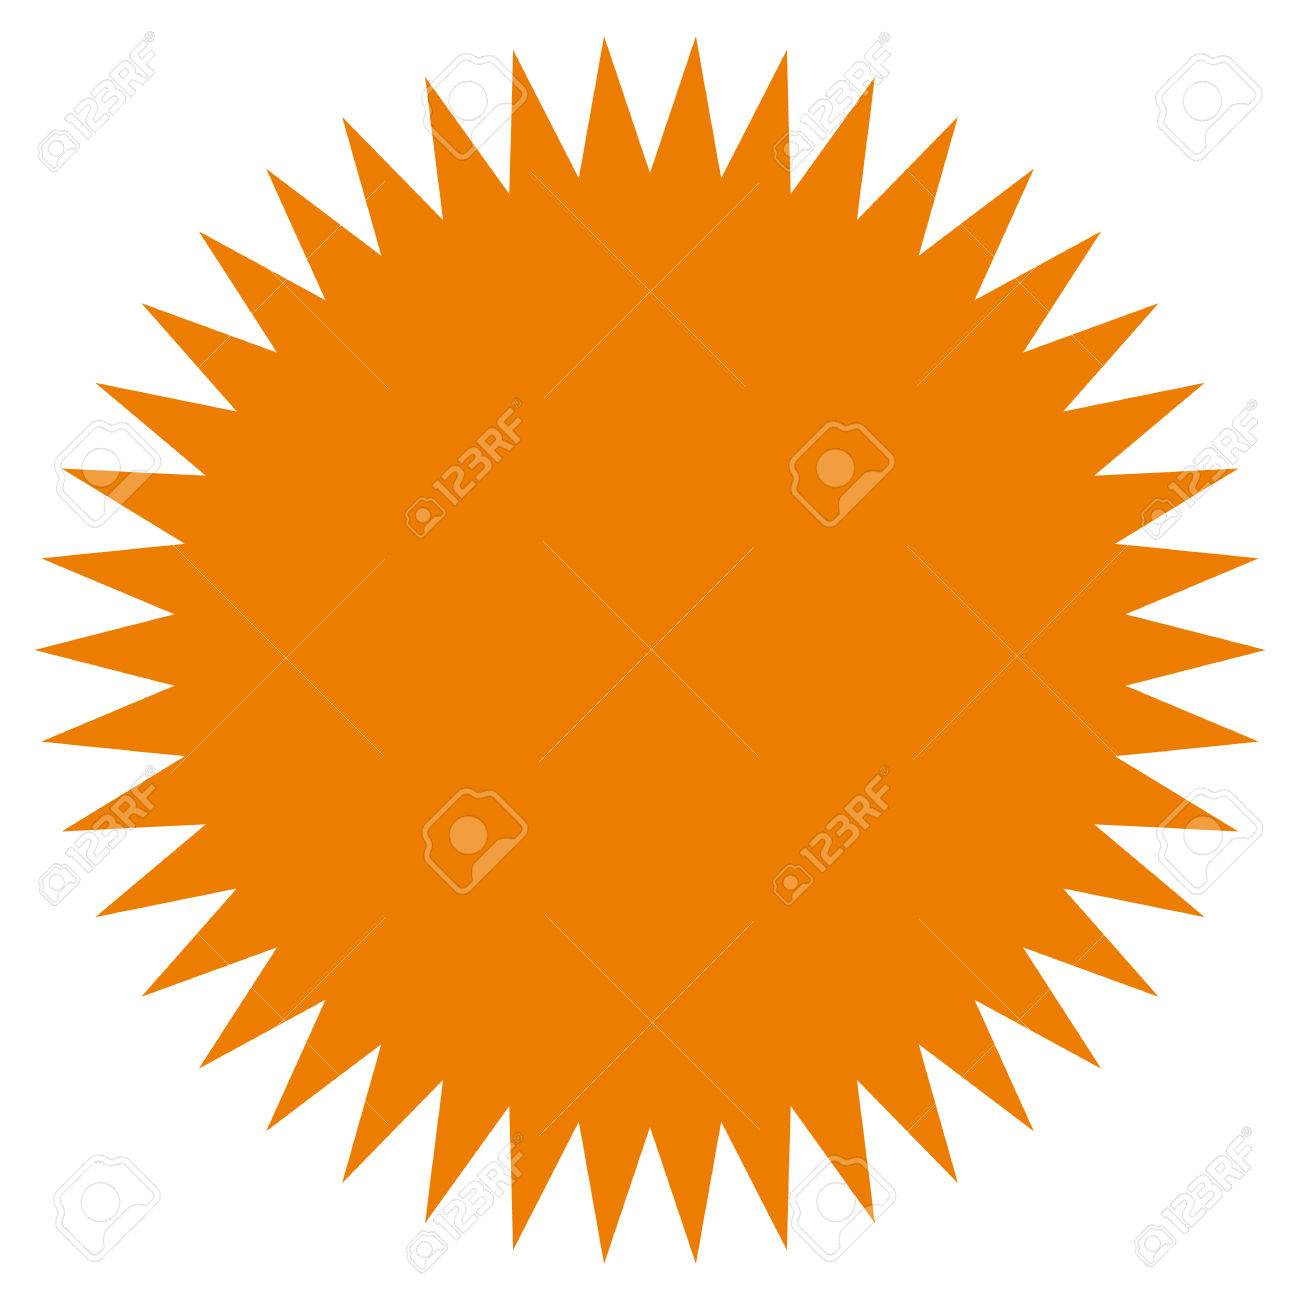 starburst sunburst shape flat price tag price flash icon royalty rh 123rf com sunburst vector free download sunburst vector png